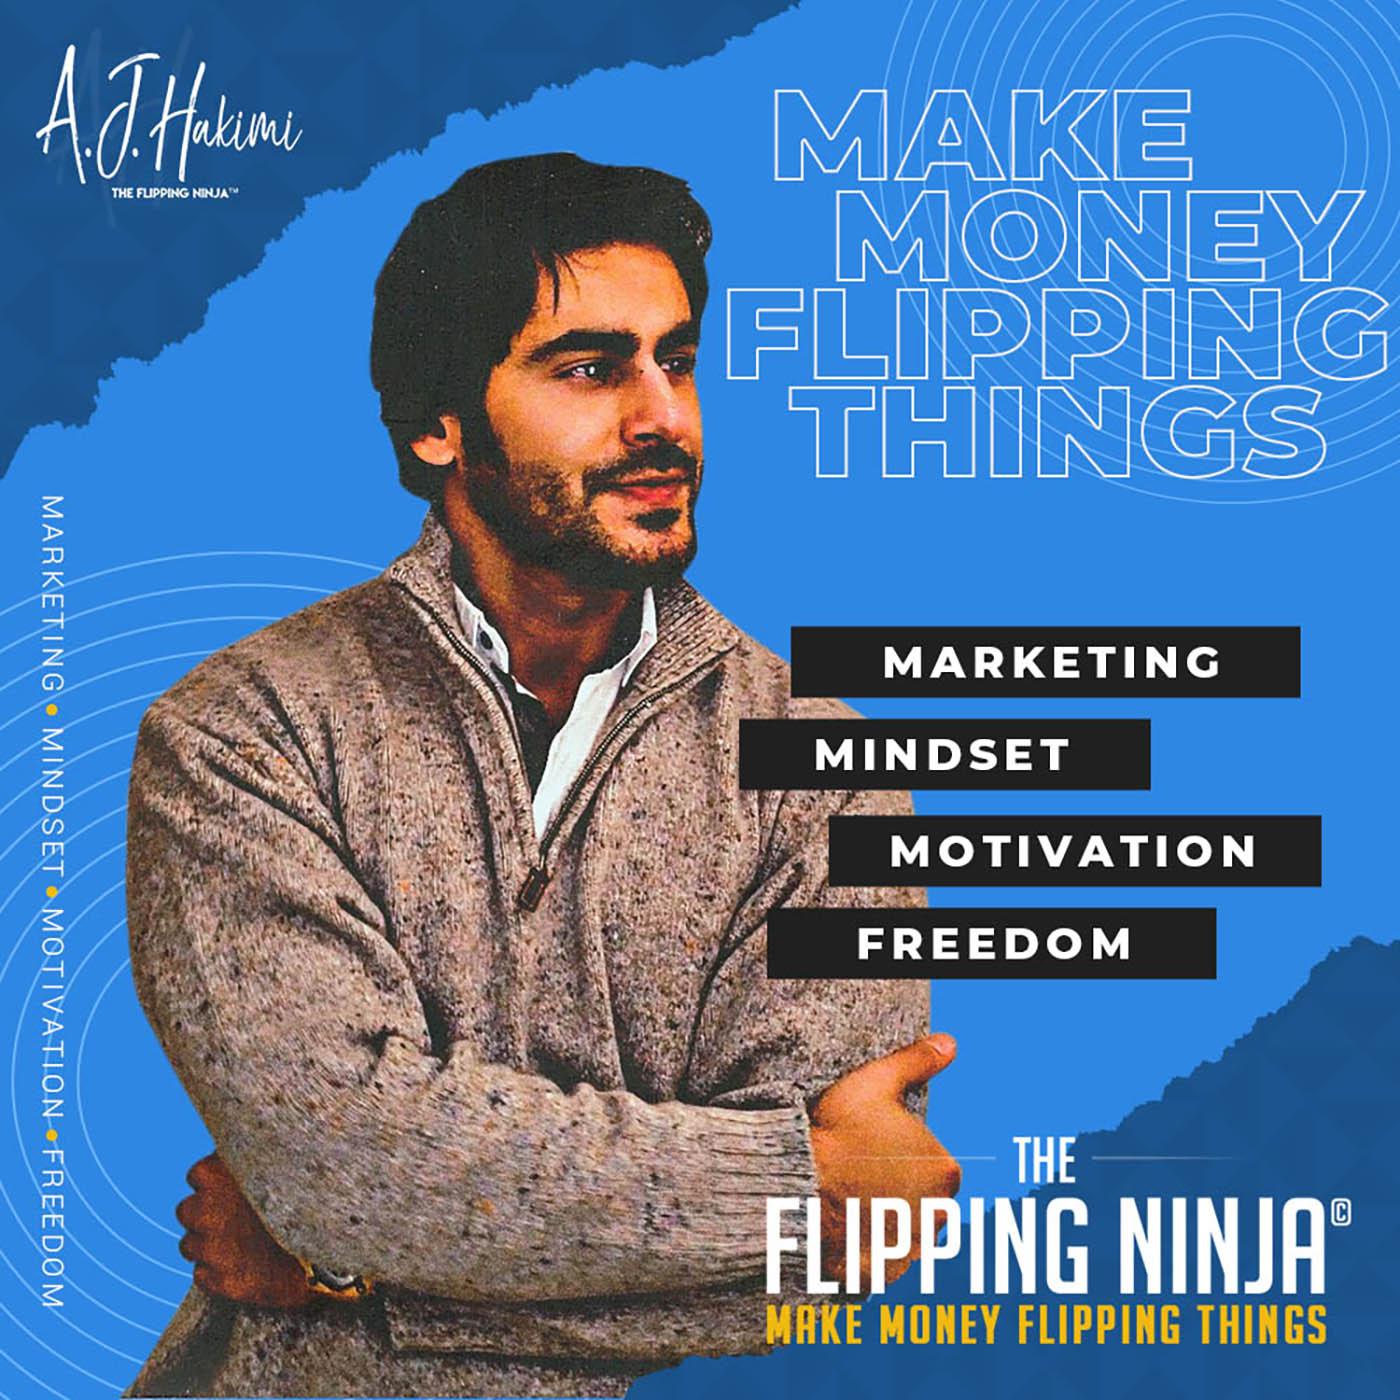 The Flipping Ninja Podcast: Make Money Flipping Things